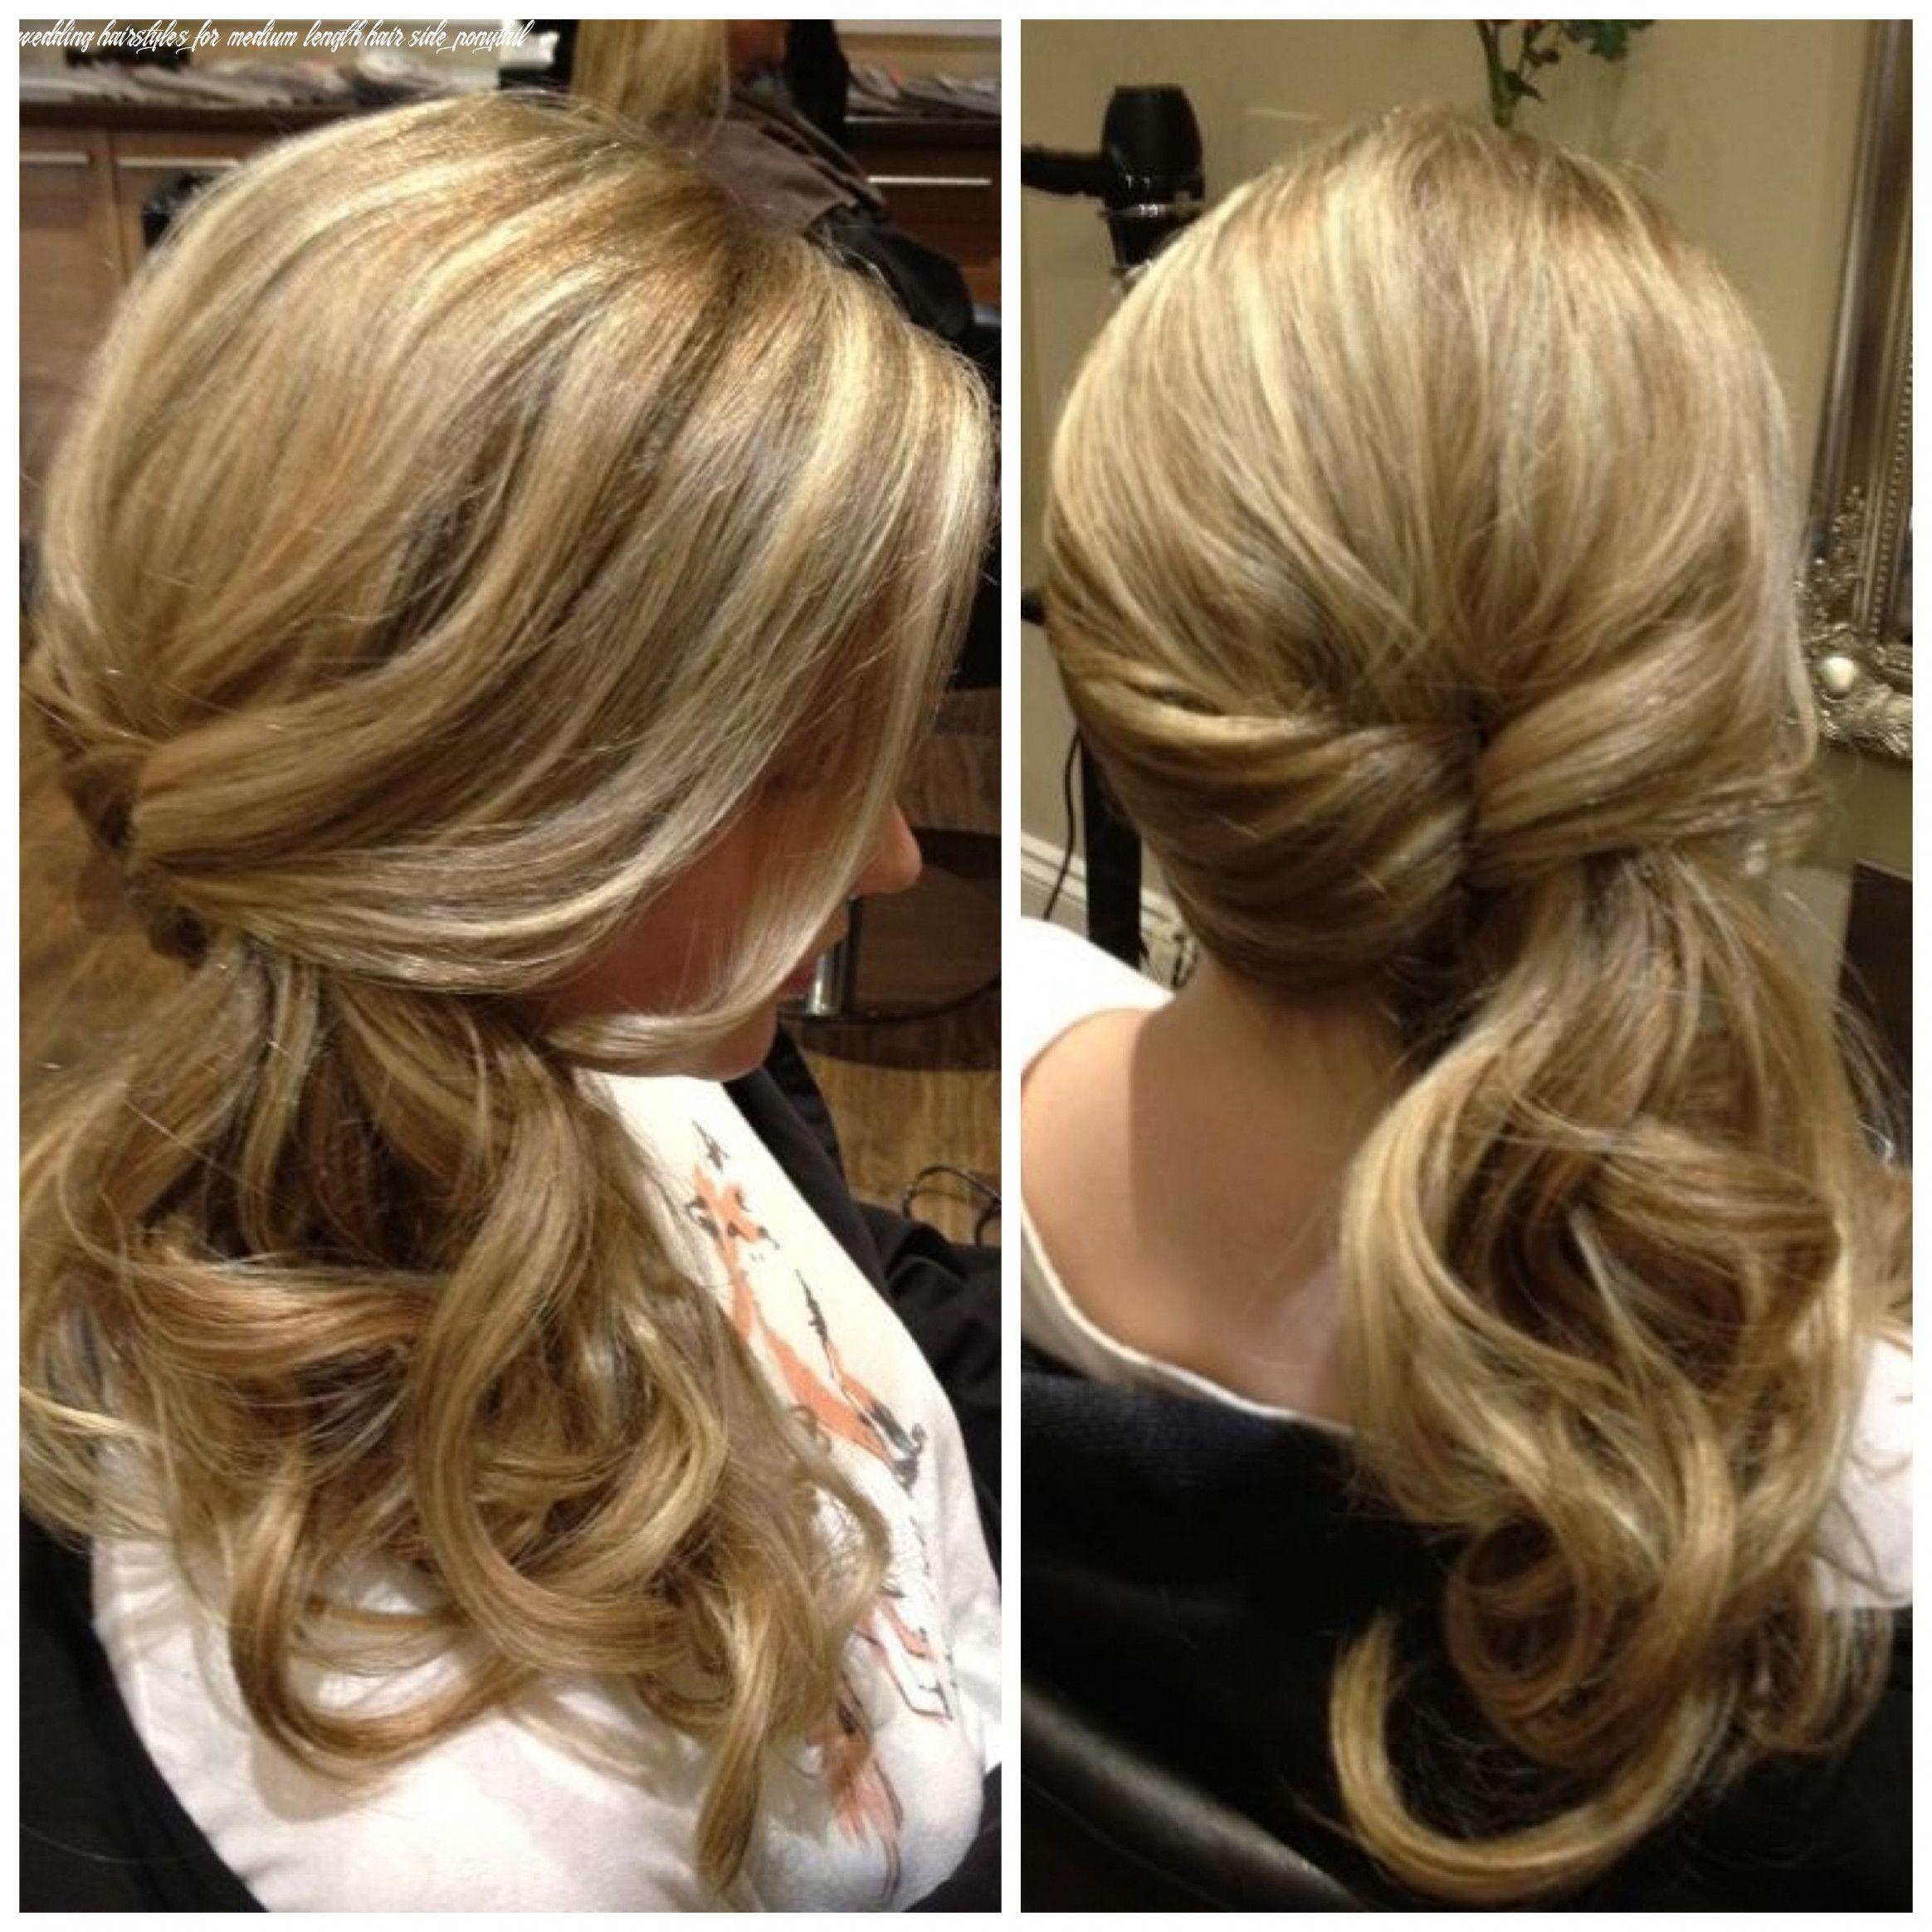 8 Wedding Hairstyles For Medium Length Hair Side Ponytail In 2020 Side Ponytail Hairstyles Twist Ponytail Bridesmaid Ponytail